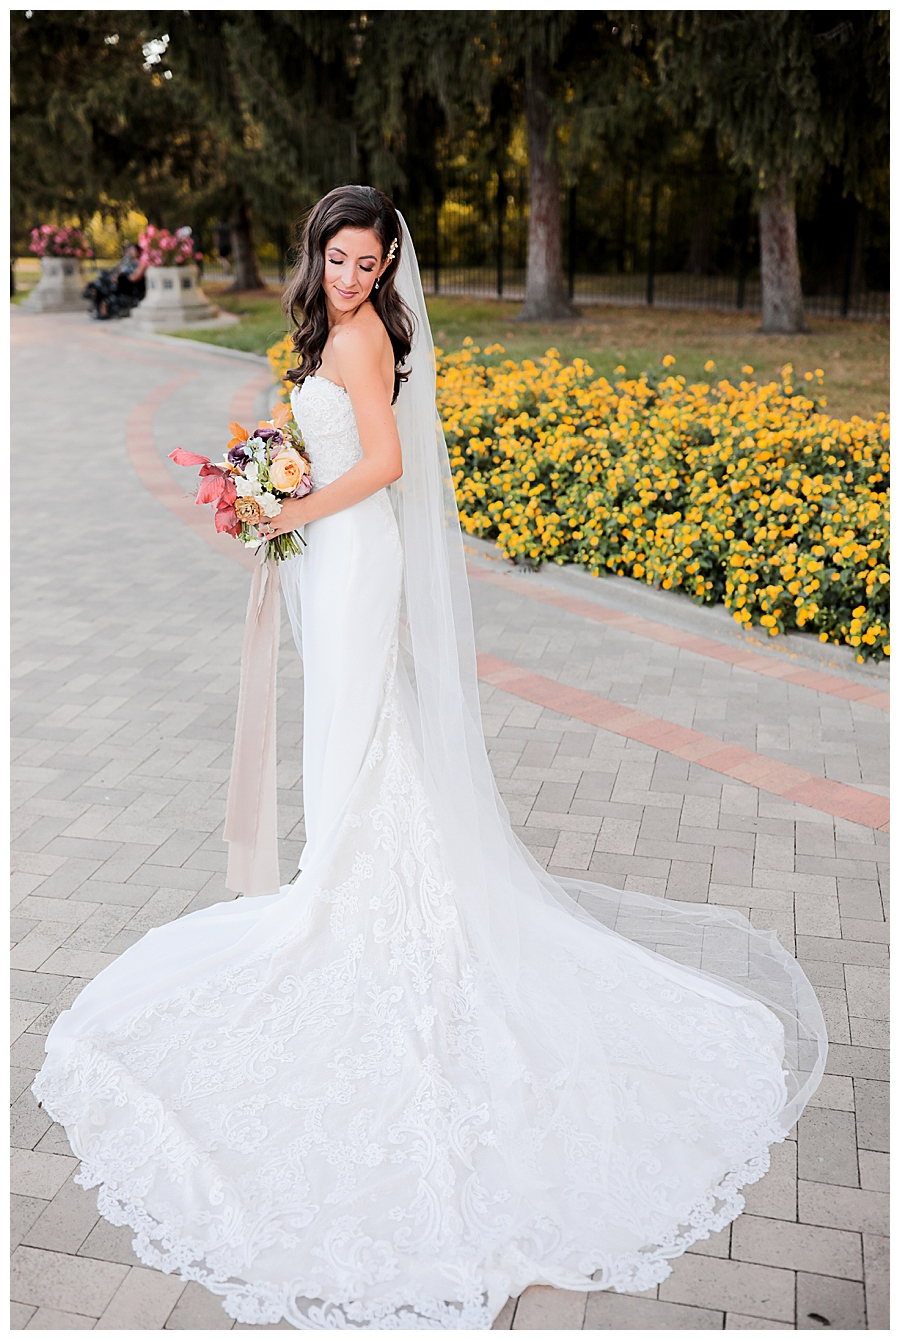 Indianapolis-Indiana-Wedding-Photography-Meghan-Harrison_0309.jpg